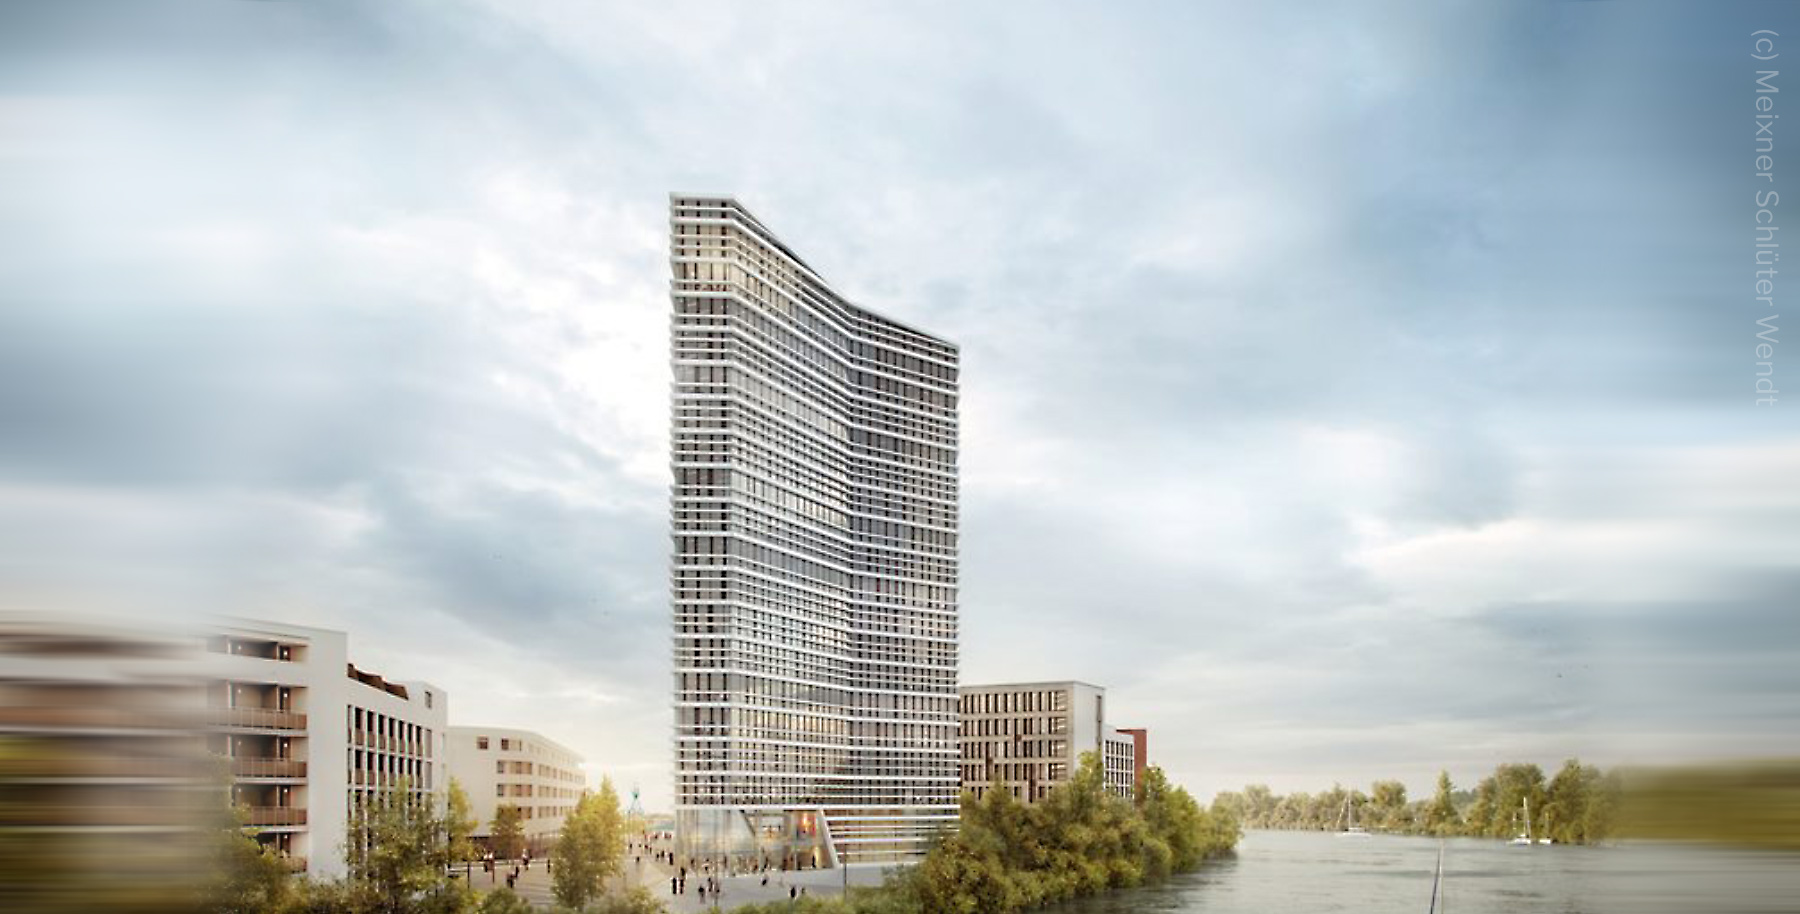 MAIN GATE EAST - New office tower in Offenbach - Highrise Offenbach Harbor - Architect: Meixner Schlüter Wendt - Developer: EYEMAXX